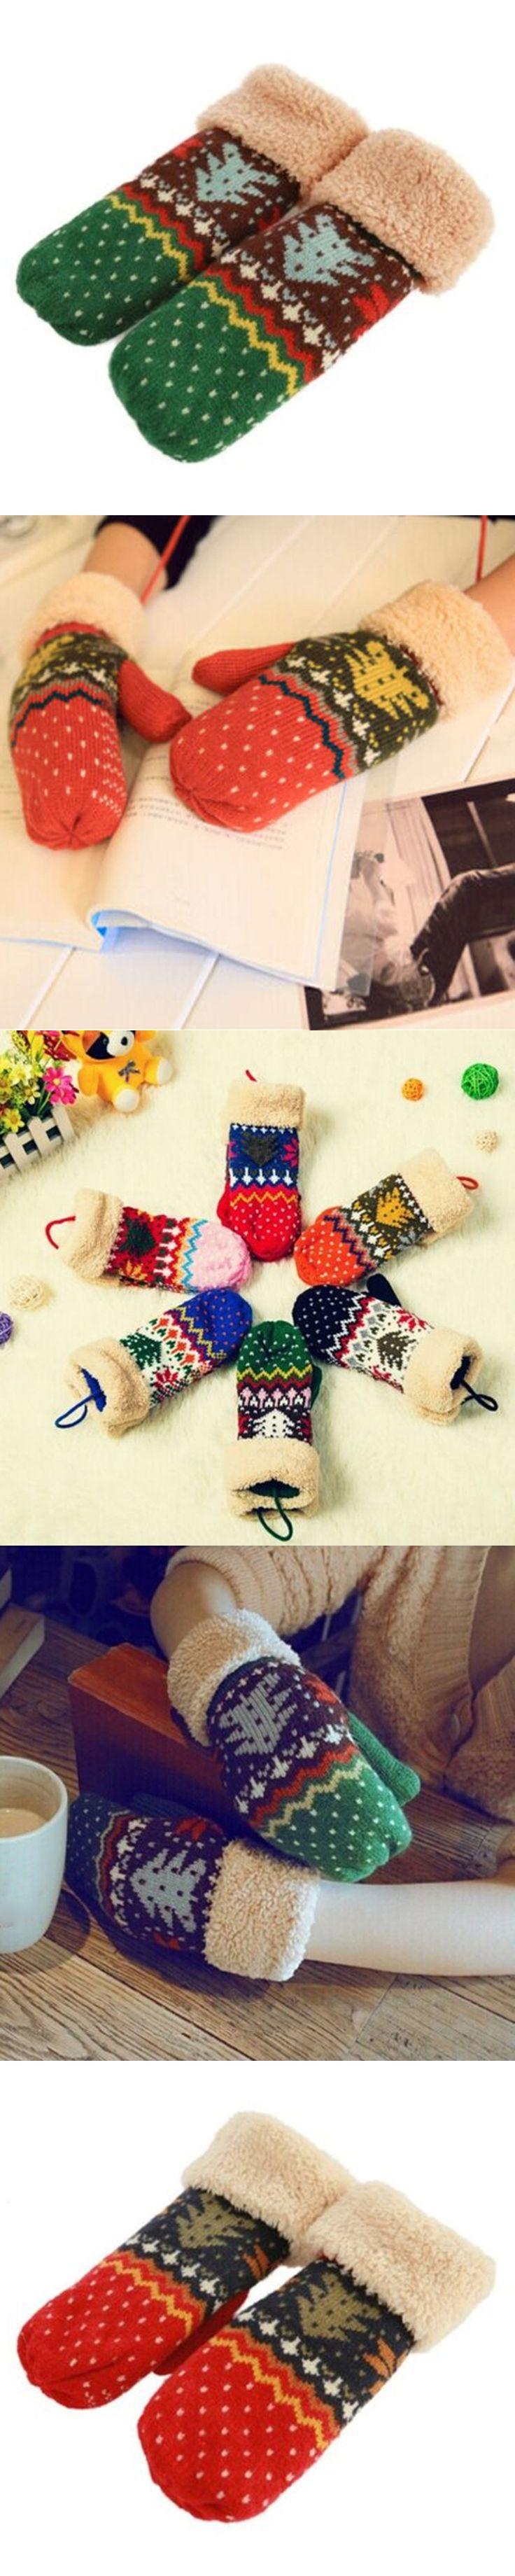 2016 Chrismas Tree Pattern Double Layer Knit Halter Mittens Warm Winter Gloves Women 8OOH